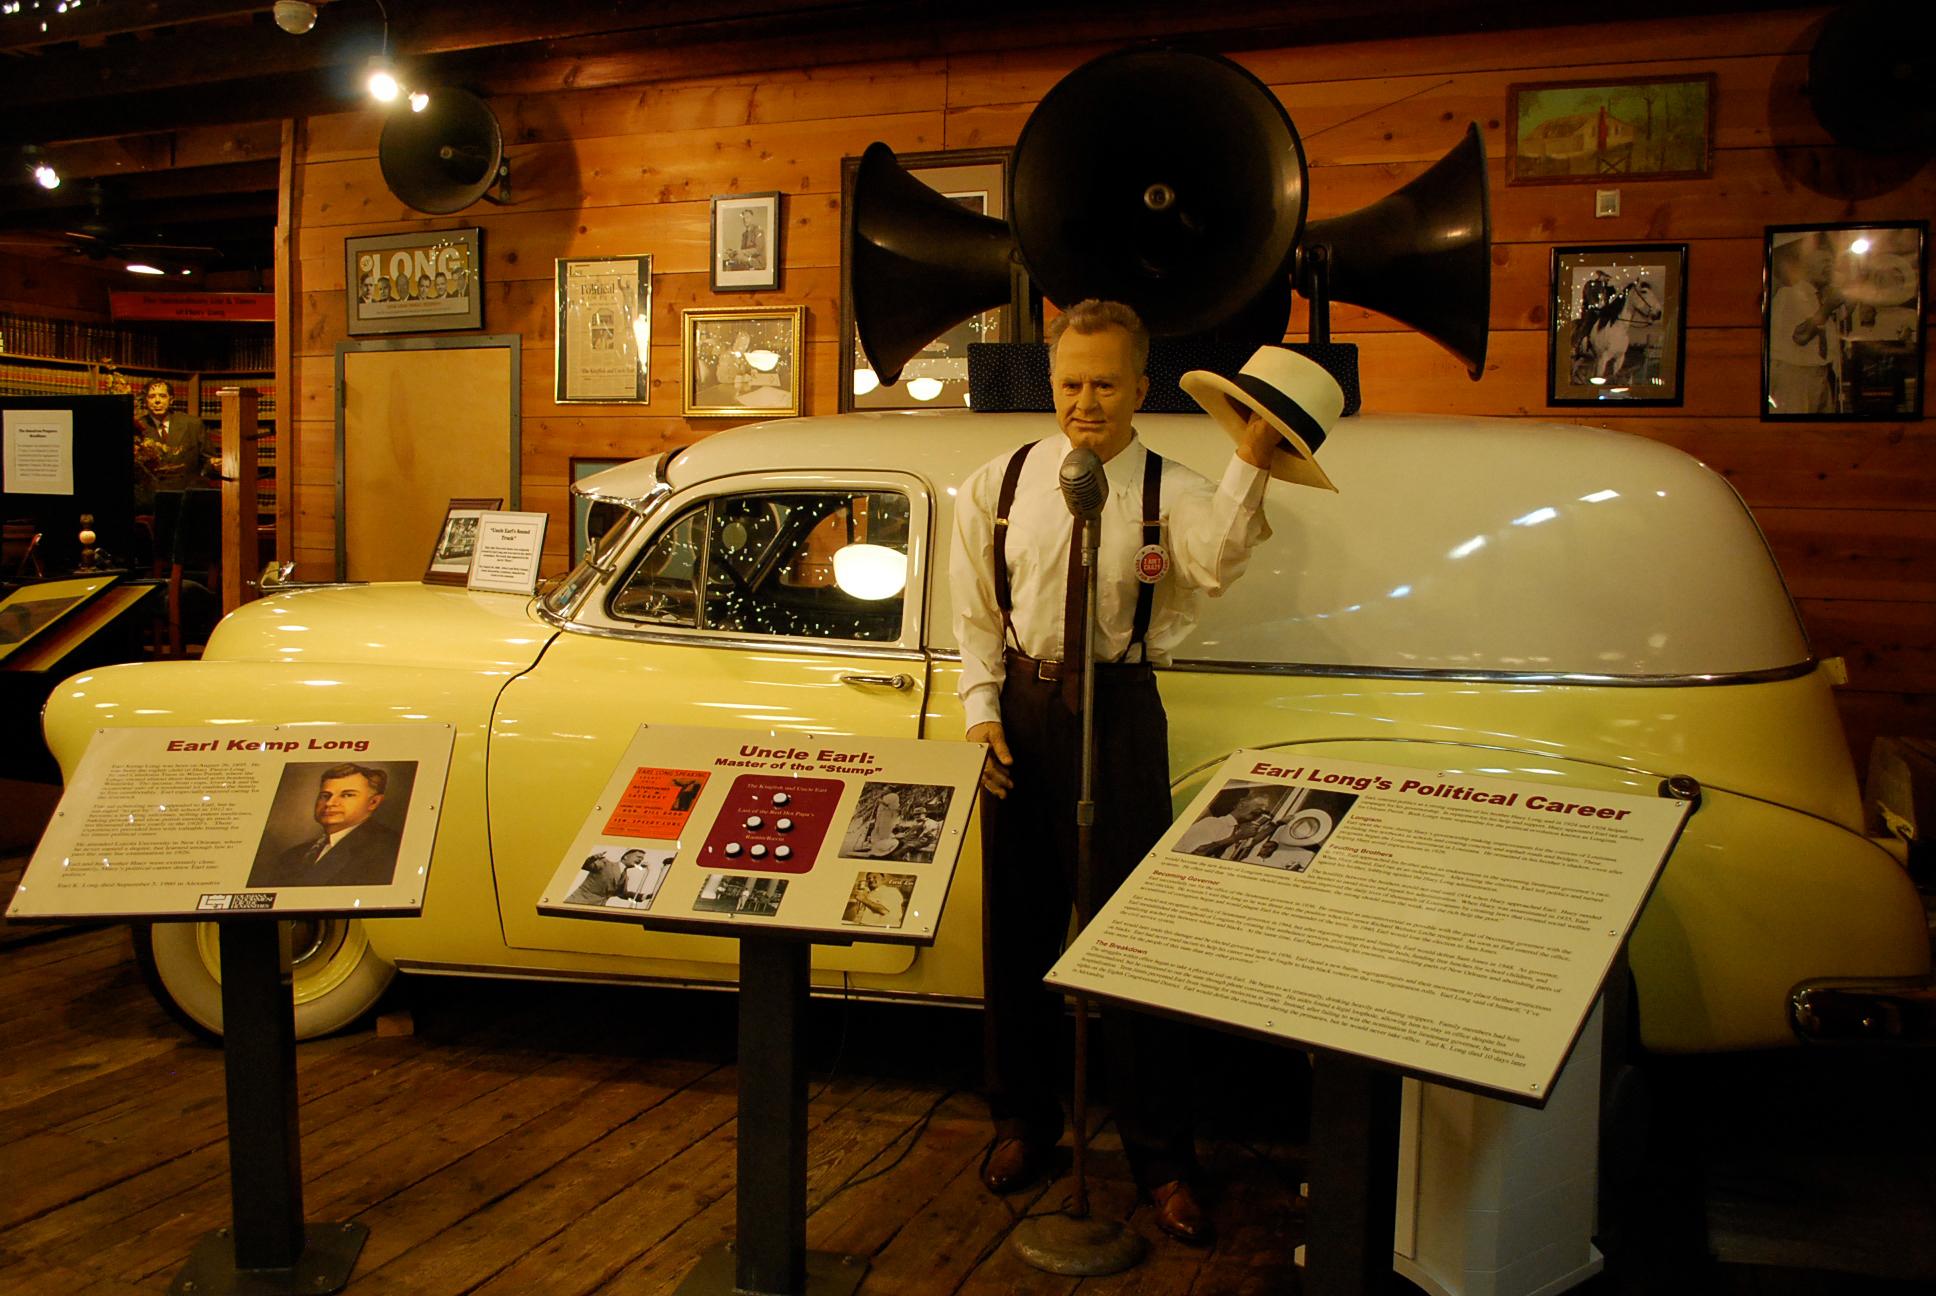 Earl Long Exhibit